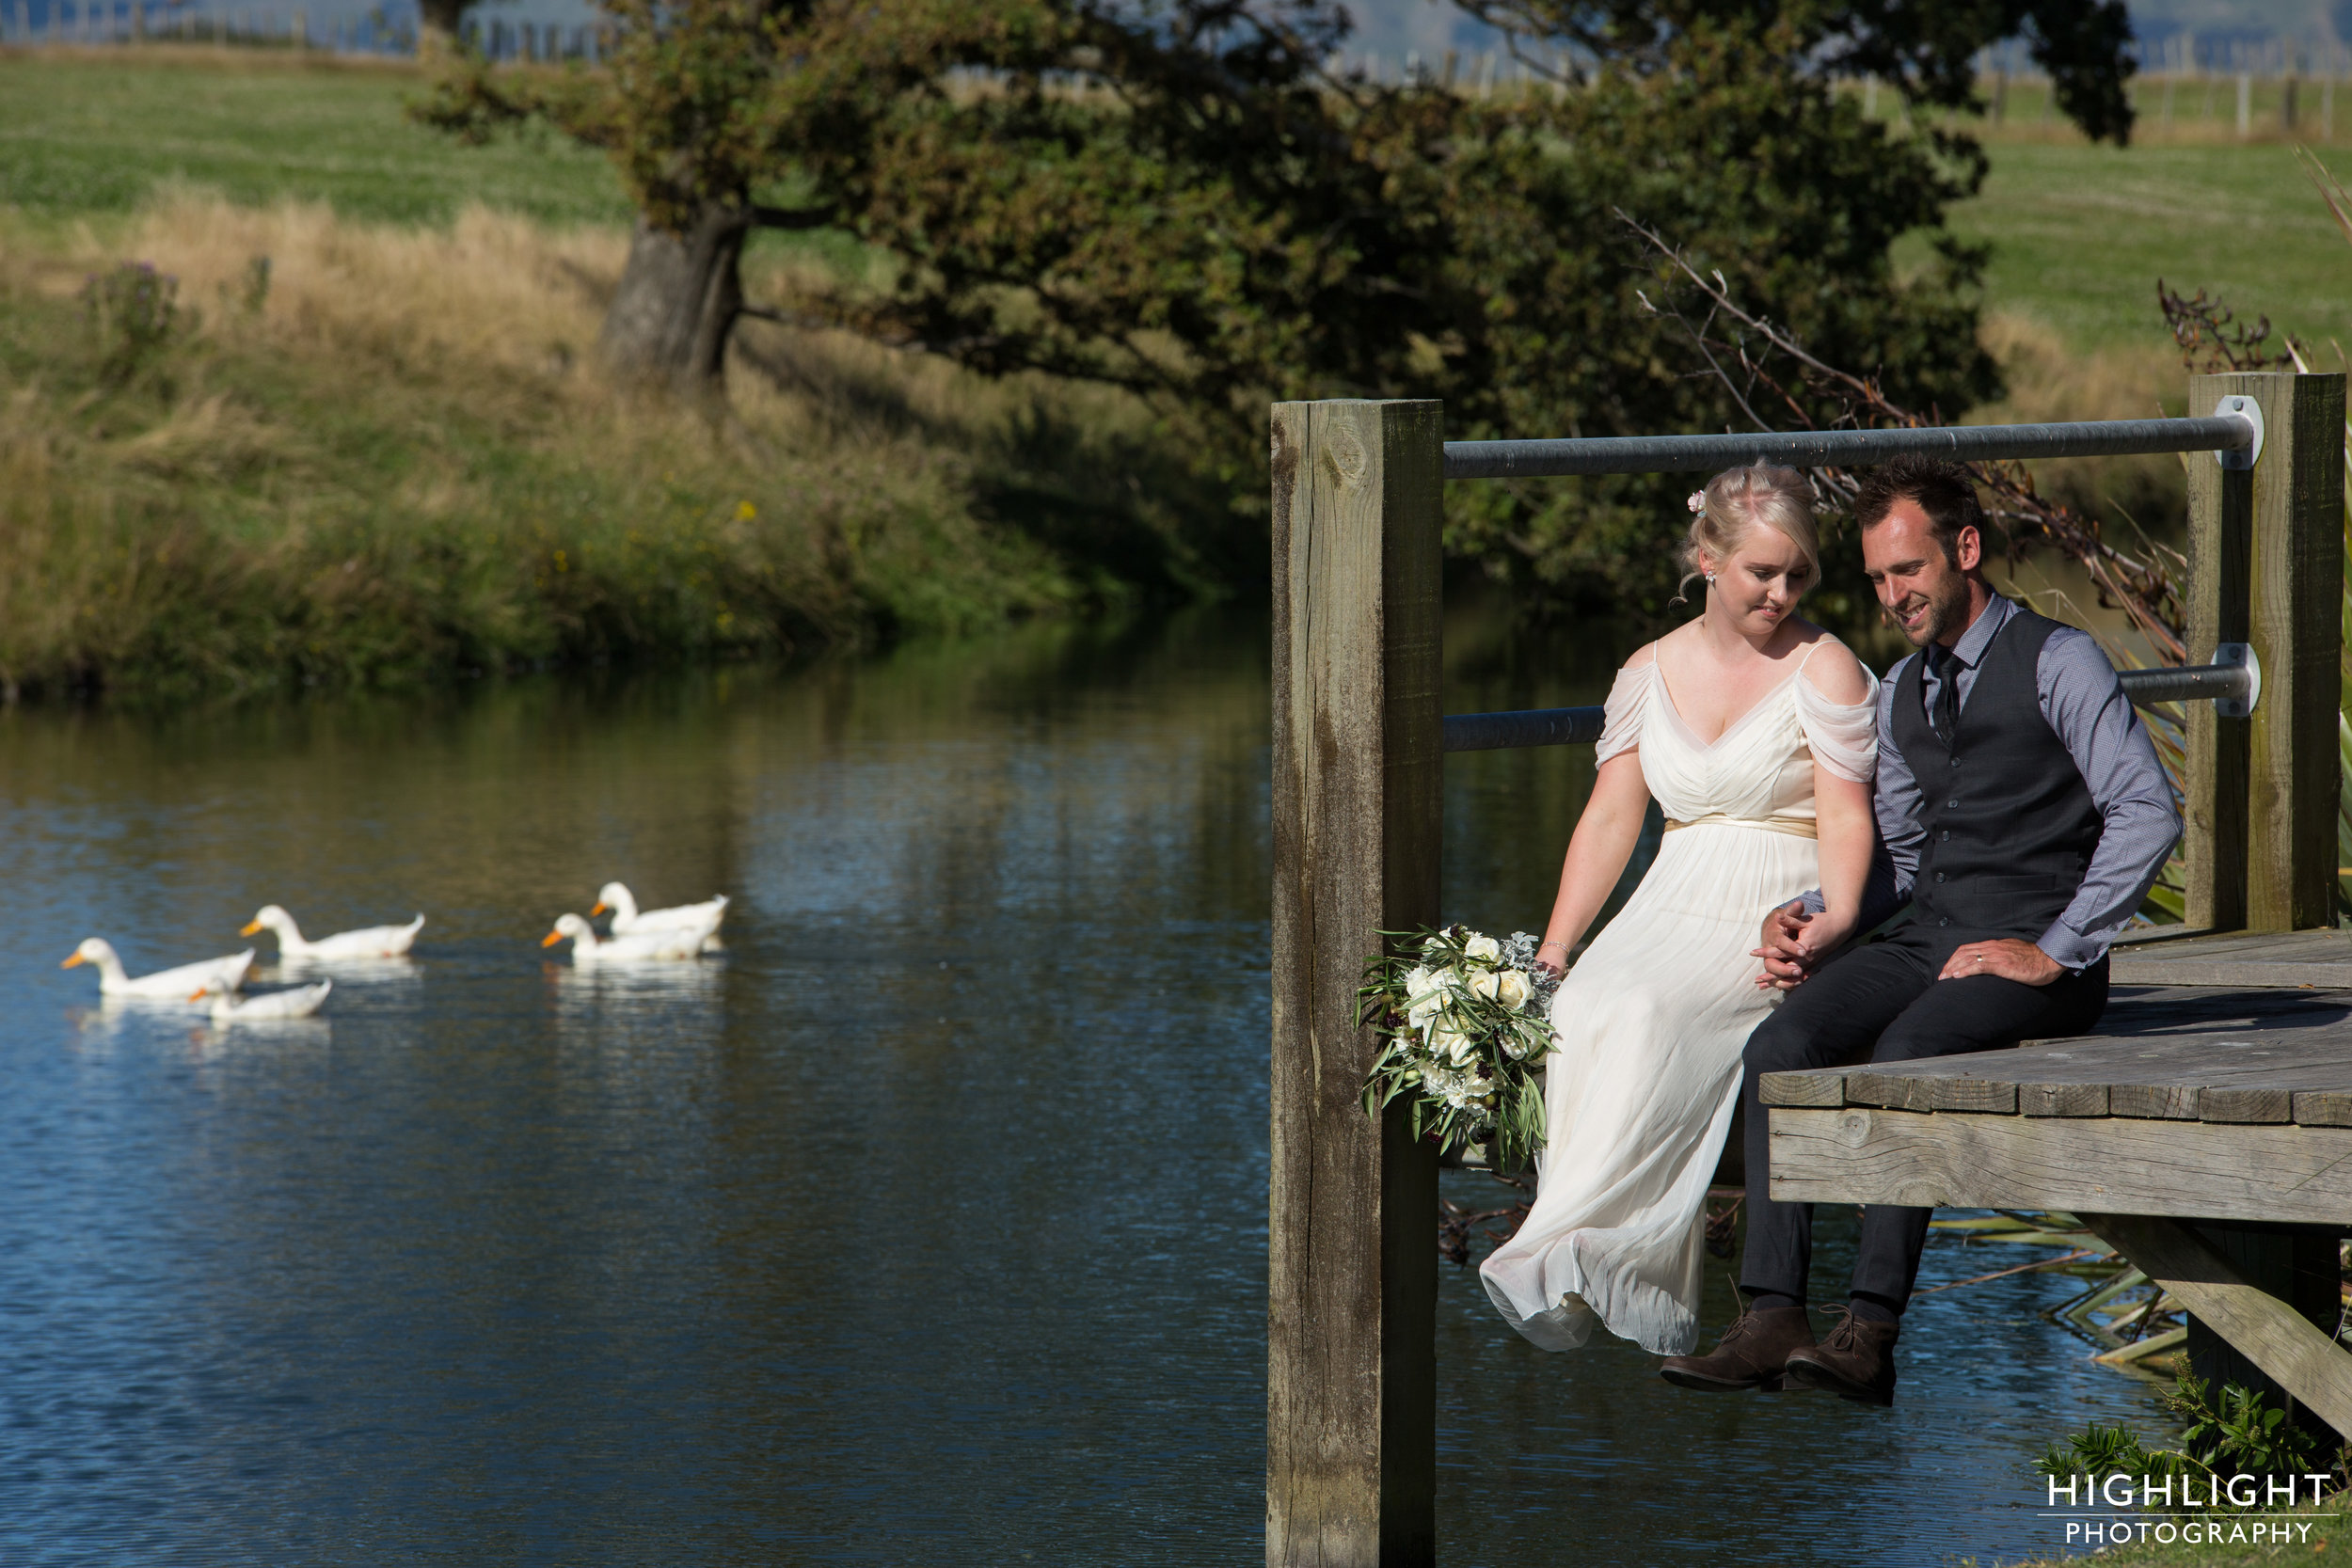 rose-johnny-highlight-wedding-photography-palmerston-north-manawatu-hiwinui-country-estate